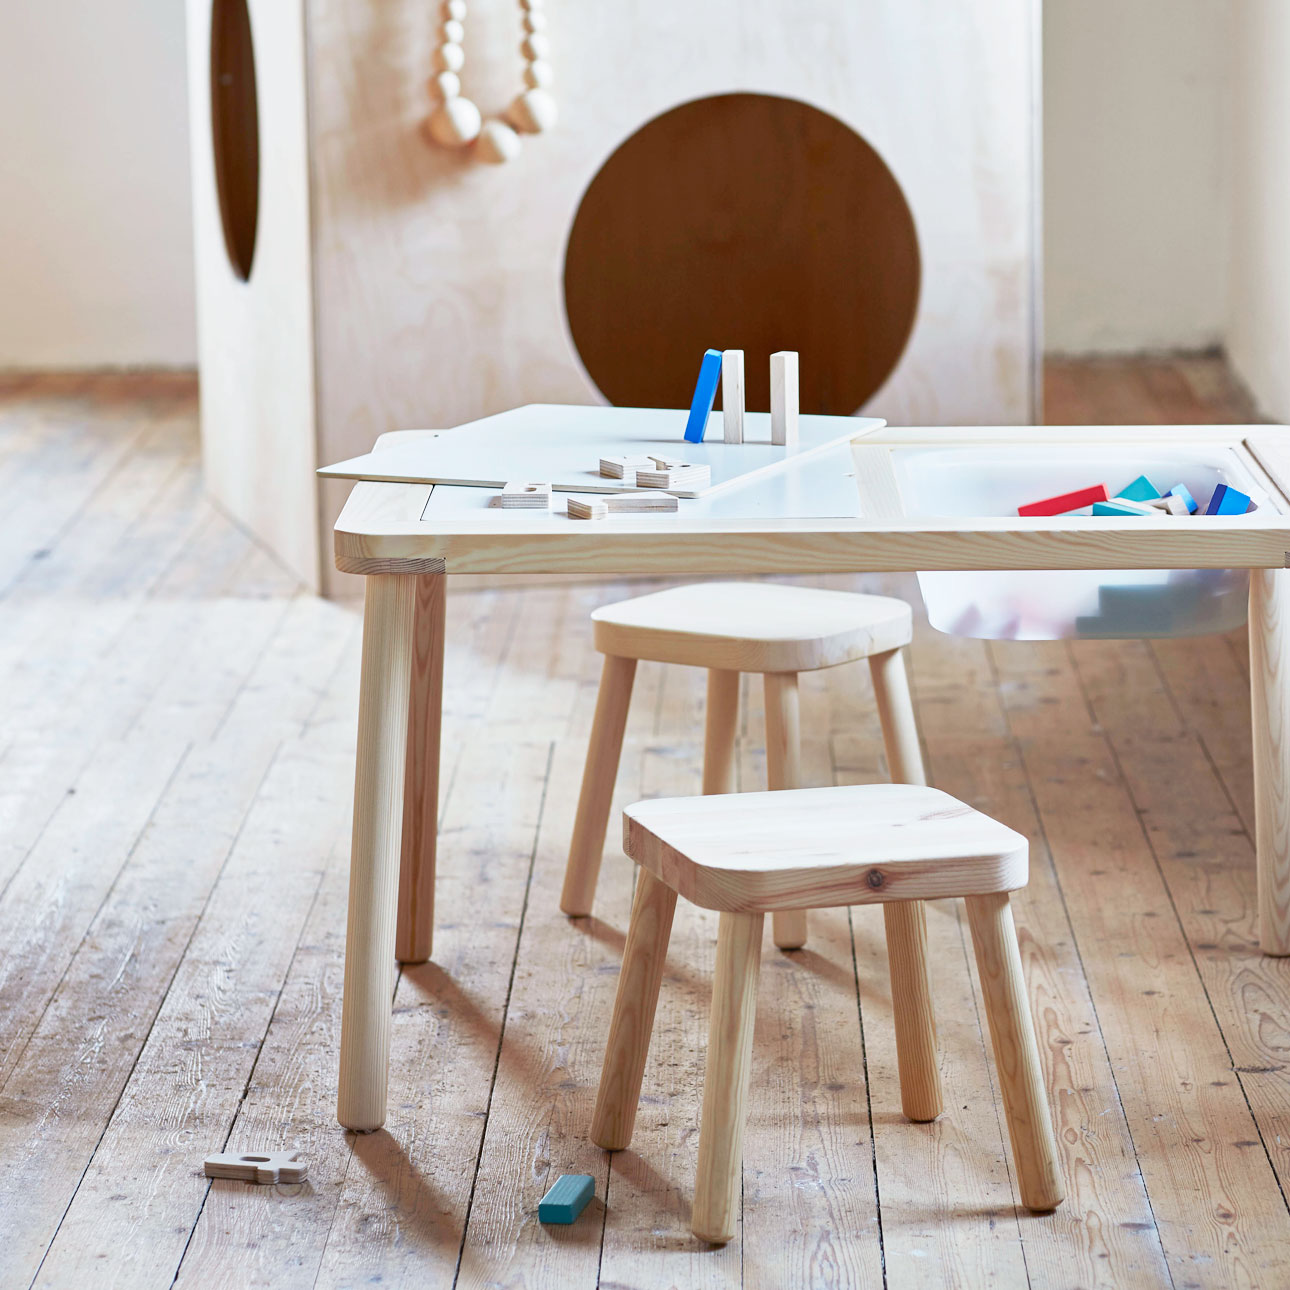 Ikea kinderland houten speeltafel